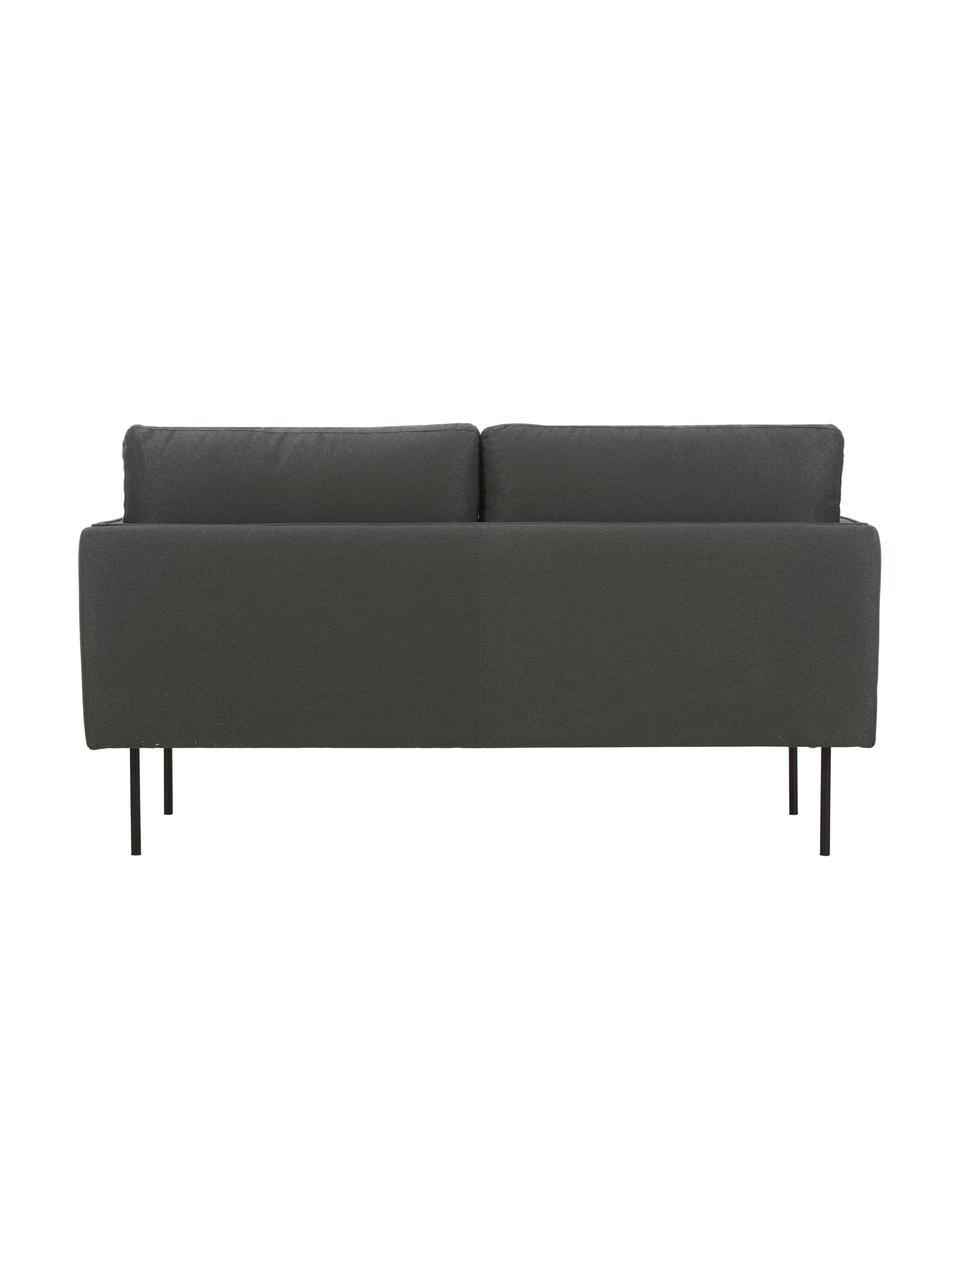 Sofa Ramira (2-Sitzer), Bezug: Polyester 20.000 Scheuert, Gestell: Massives Kiefernholz, Spe, Füße: Metall, pulverbeschichtet, Webstoff Anthrazit, 151 x 79 cm